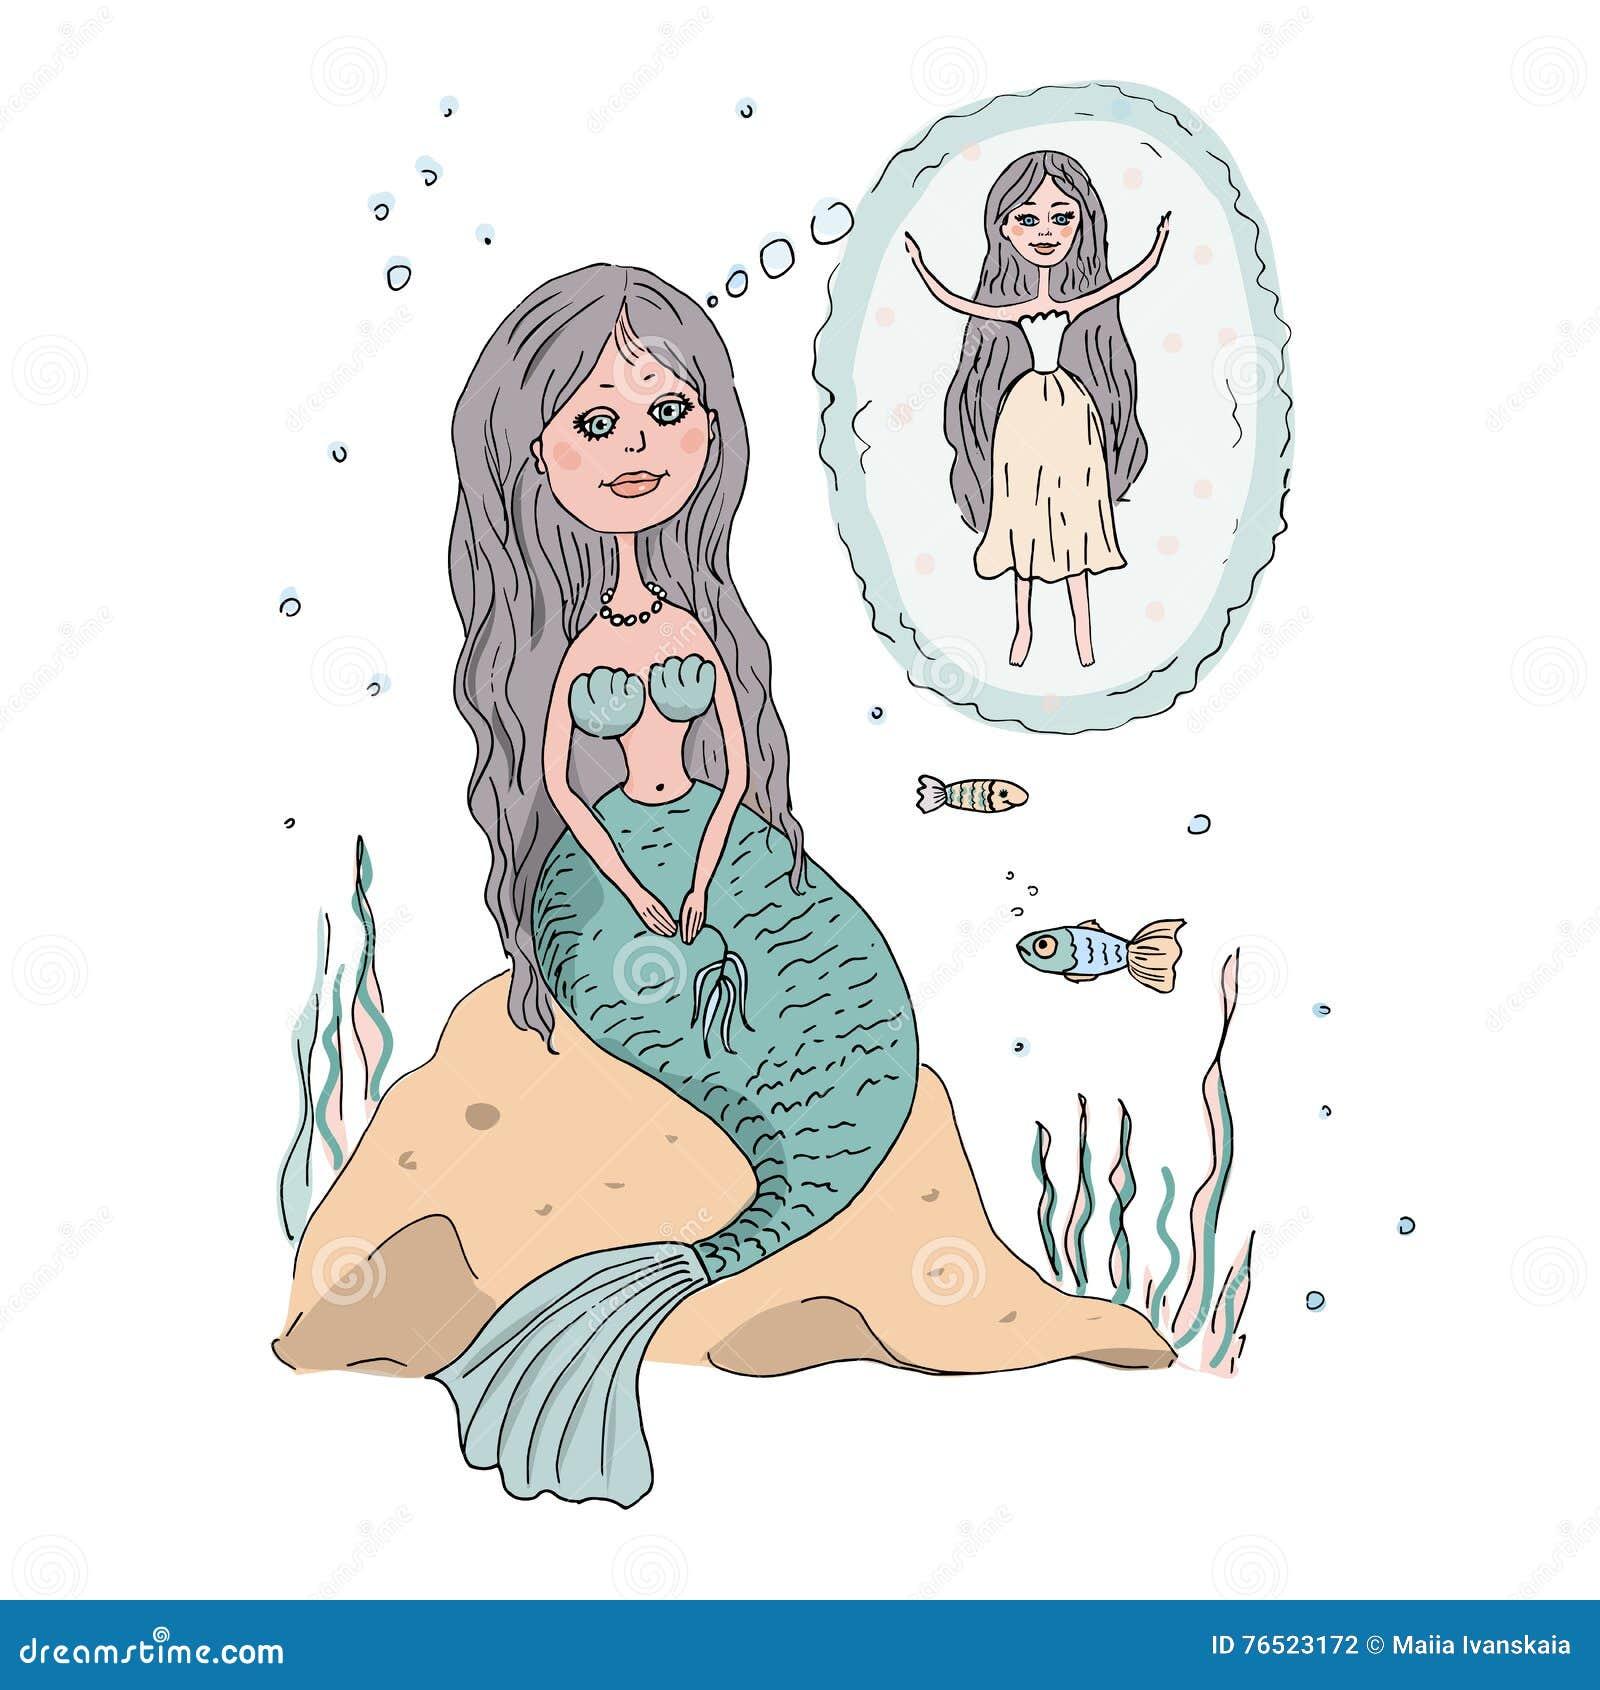 таких картинки как русалка сидит на камне медики призвали